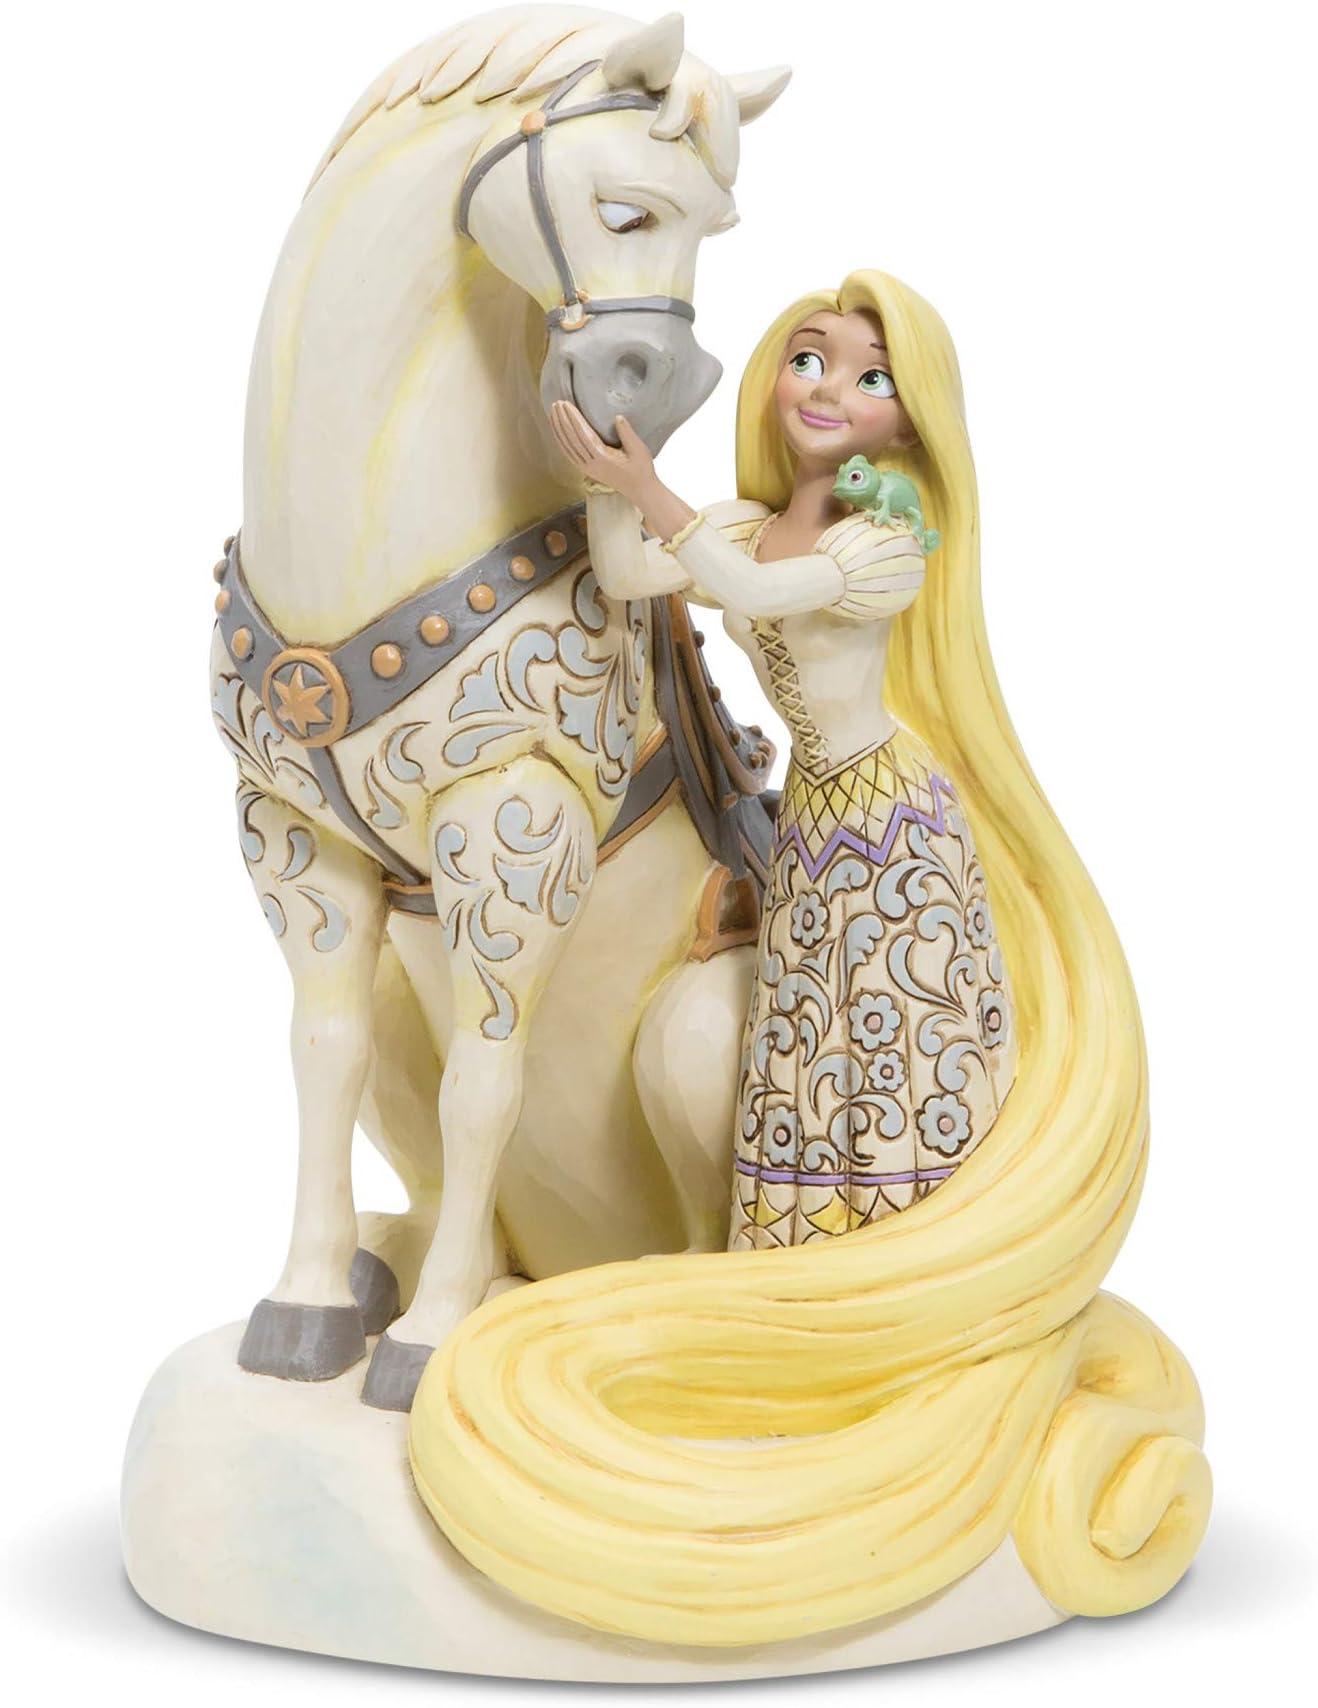 New Jim Shore Disney Traditions White Woodland Mulan Figurine #6007061